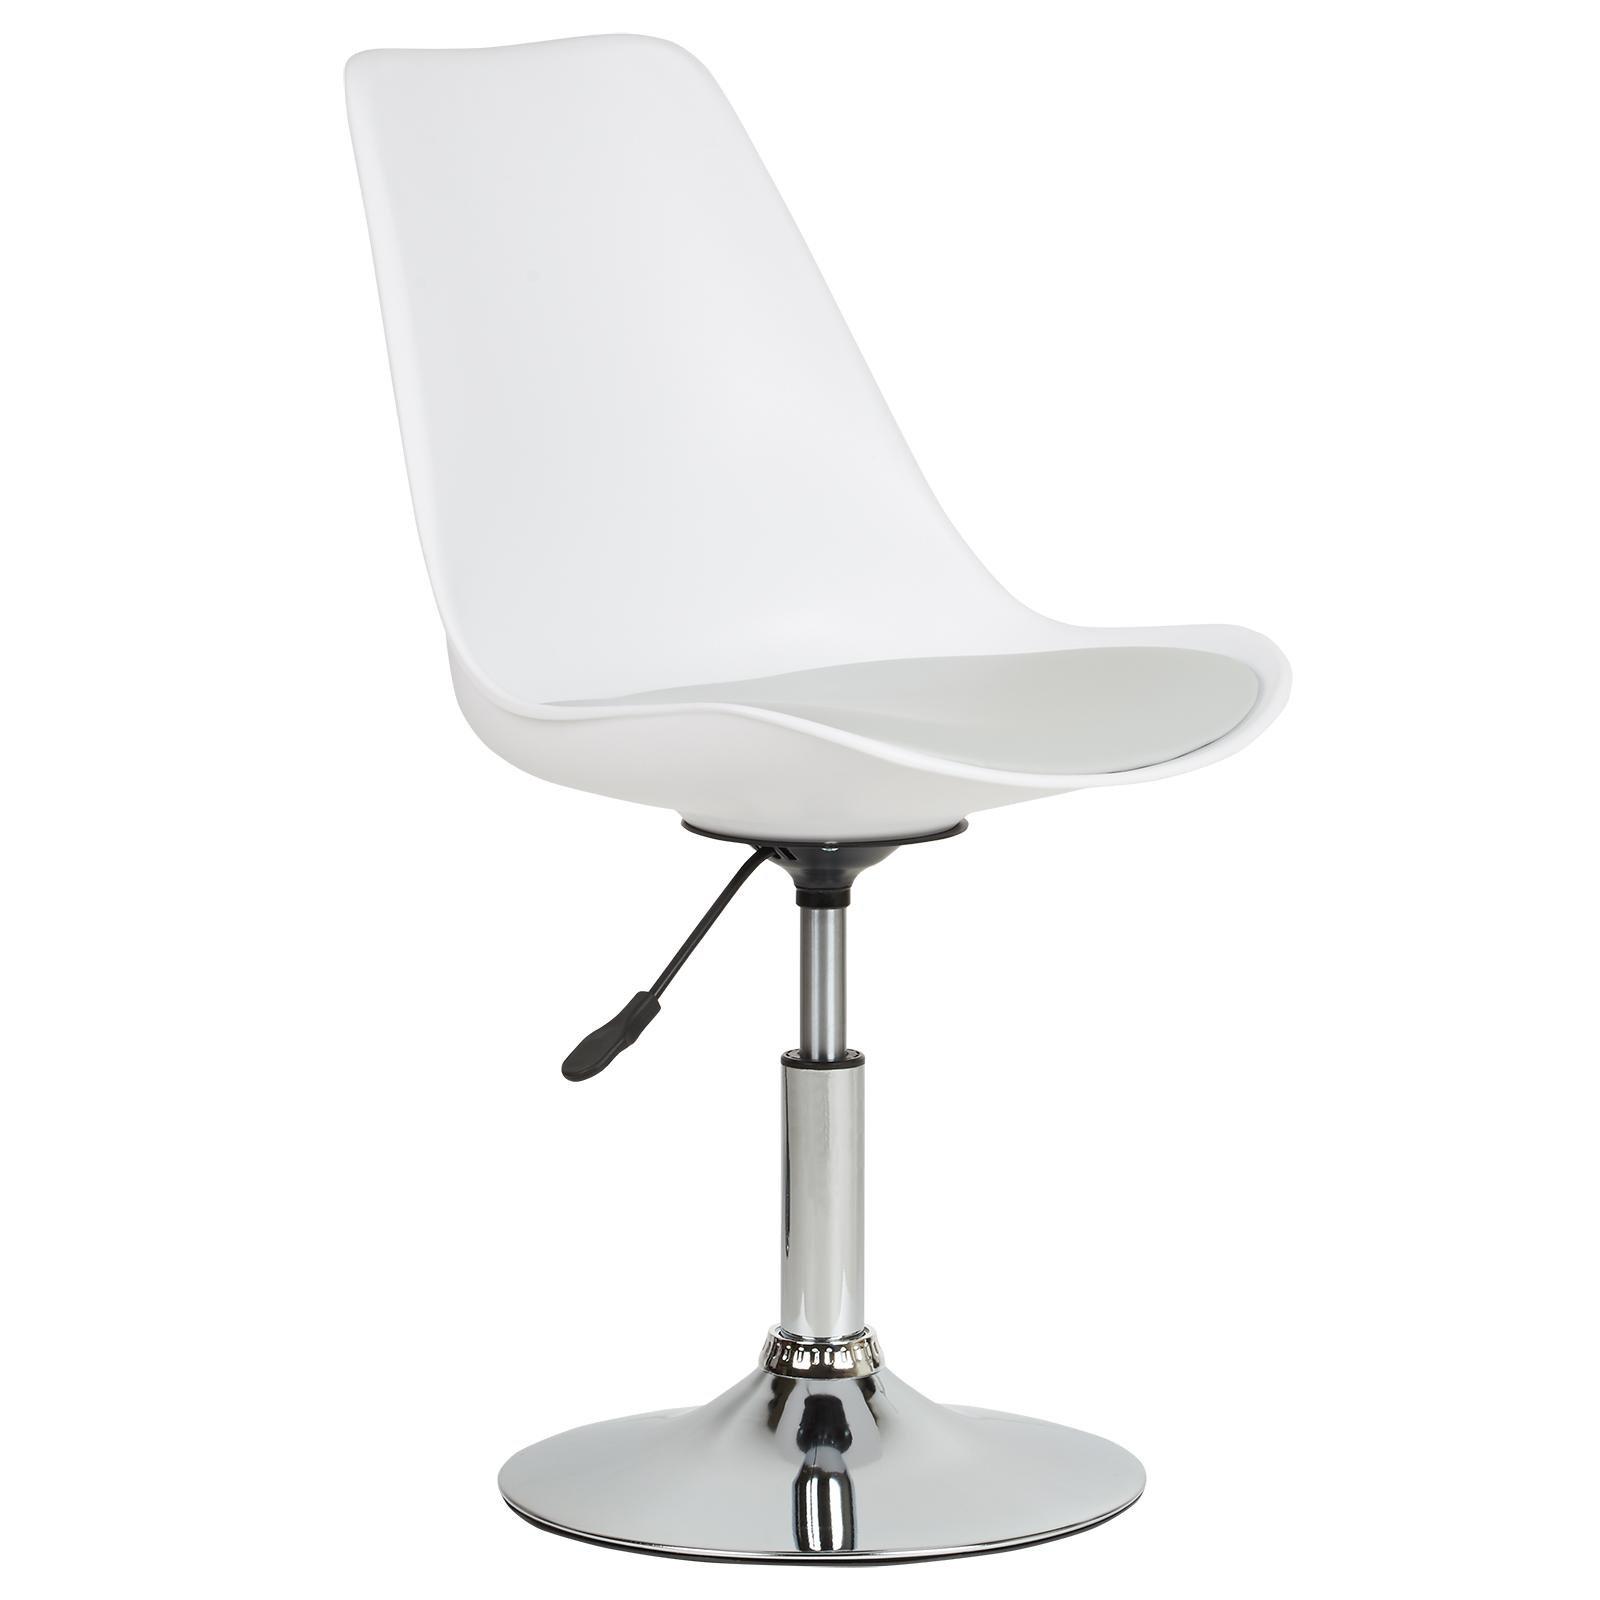 image-Hartleys White Swivel Desk Chair - Chrome Base with Grey Cushion